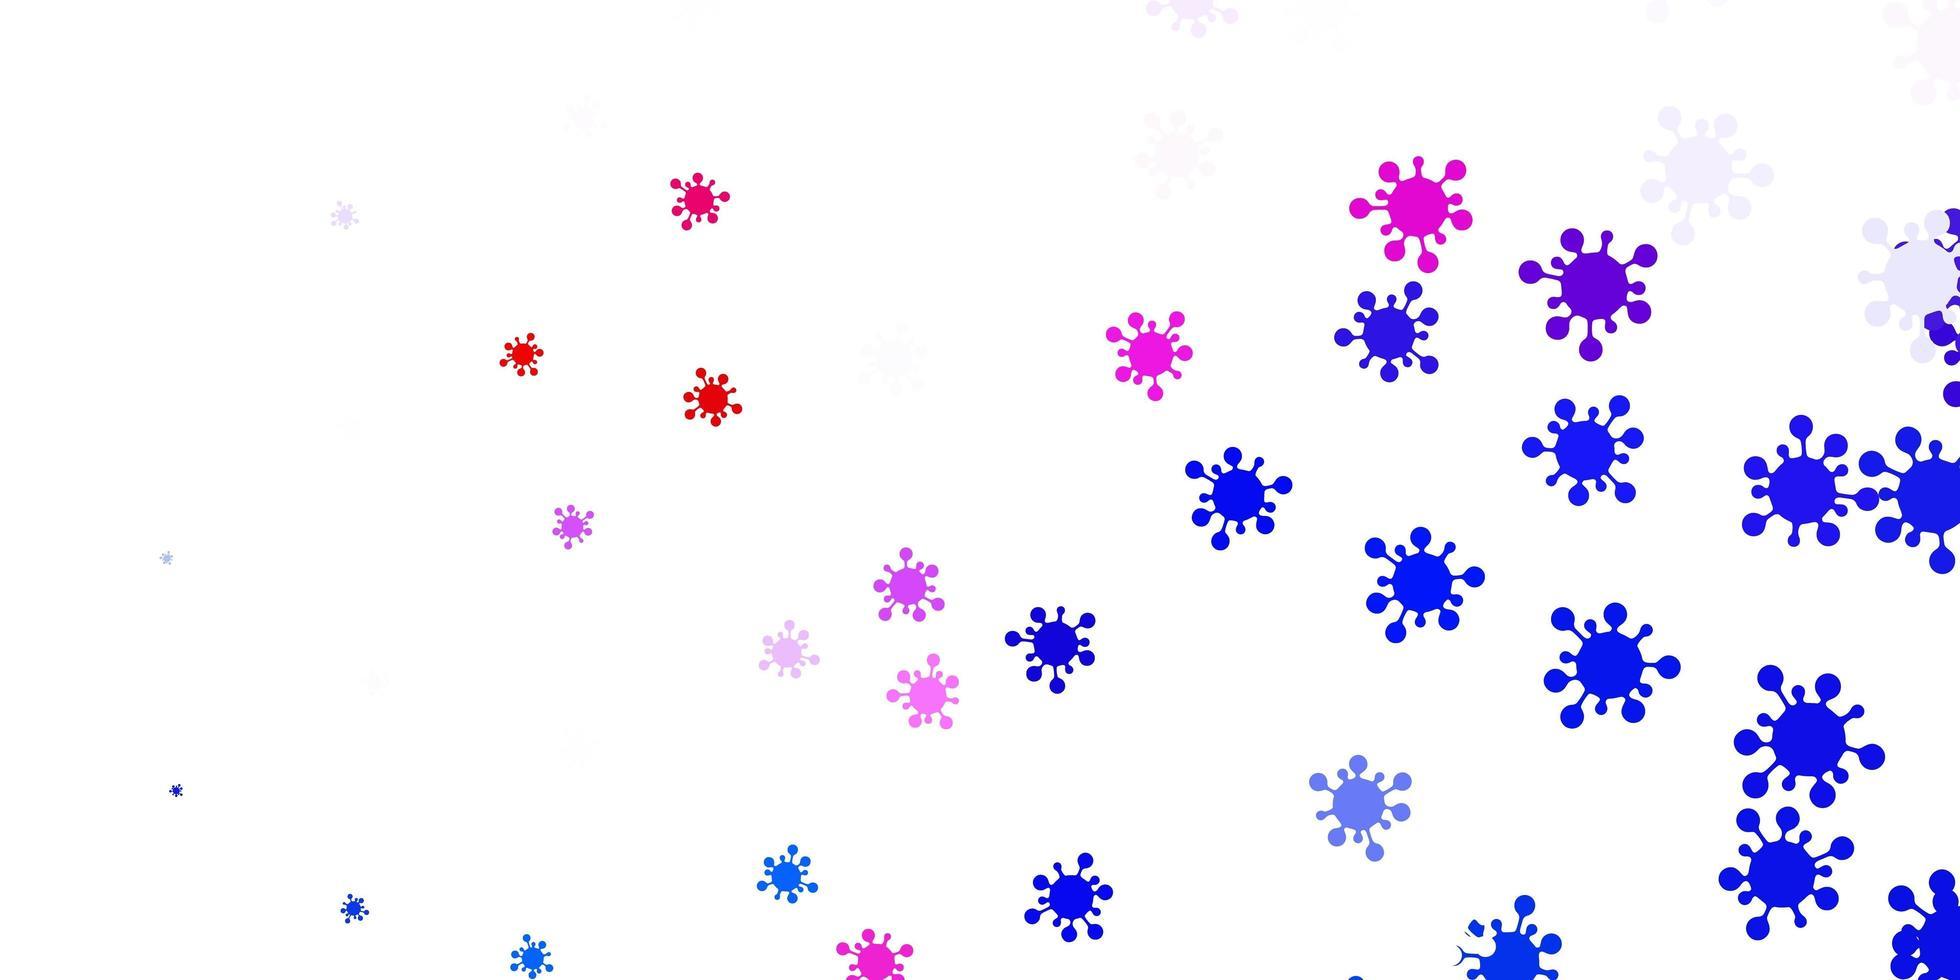 hellblaues, rotes Vektormuster mit Coronavirus-Elementen. vektor